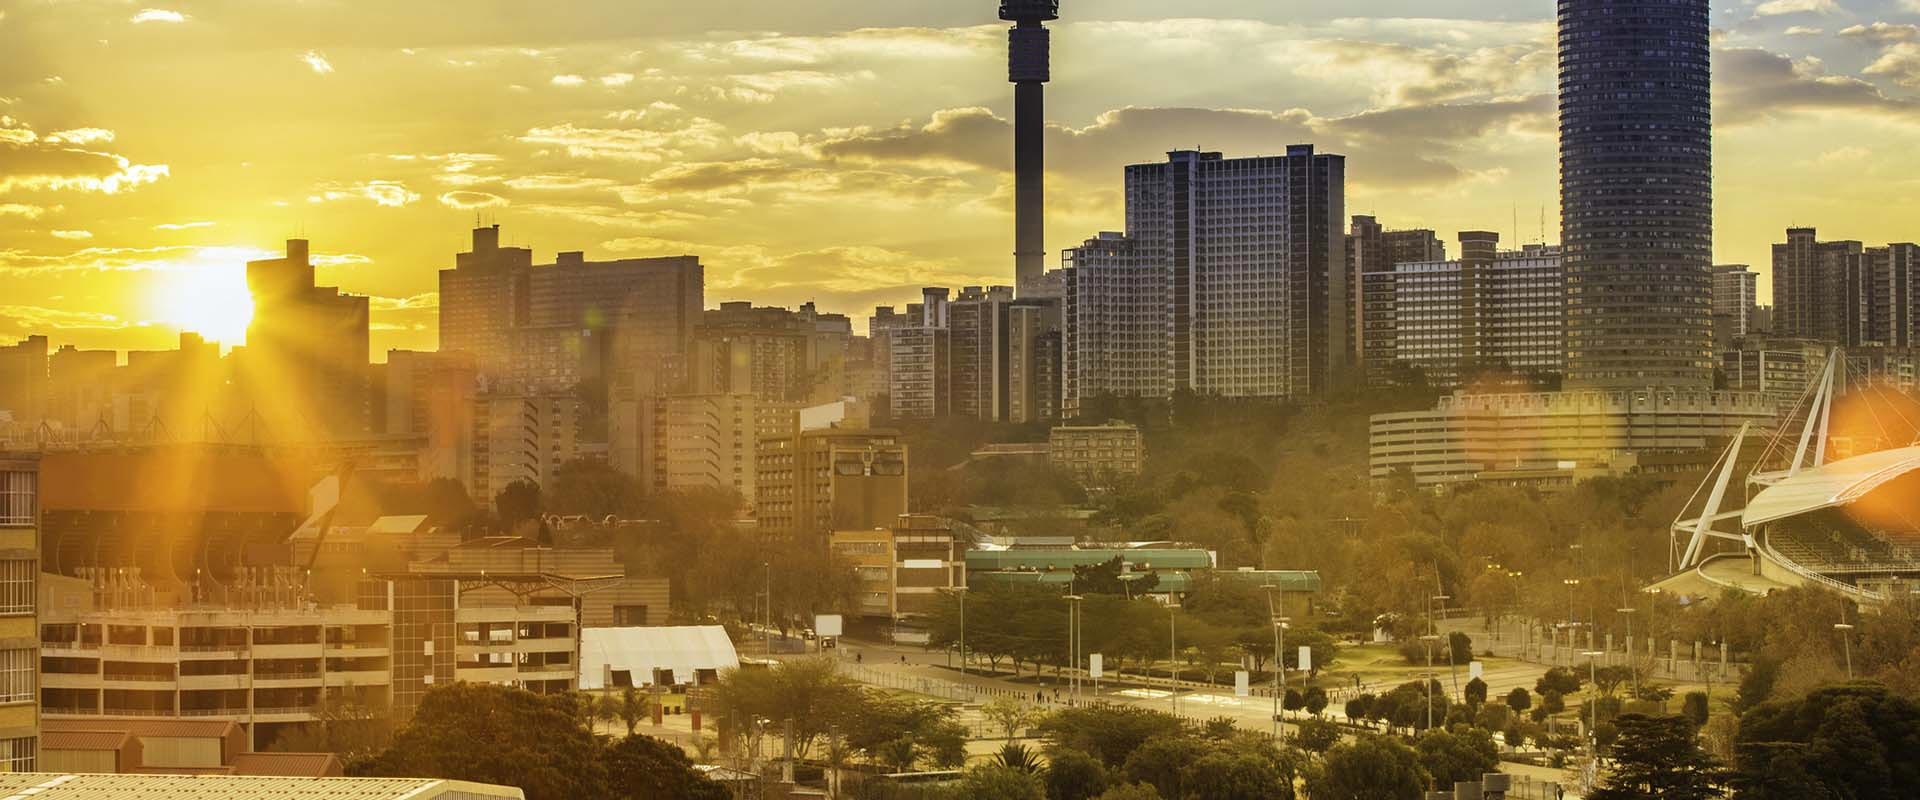 Black Friday 2021, 2022 and 2023 - PublicHolidays.co.za